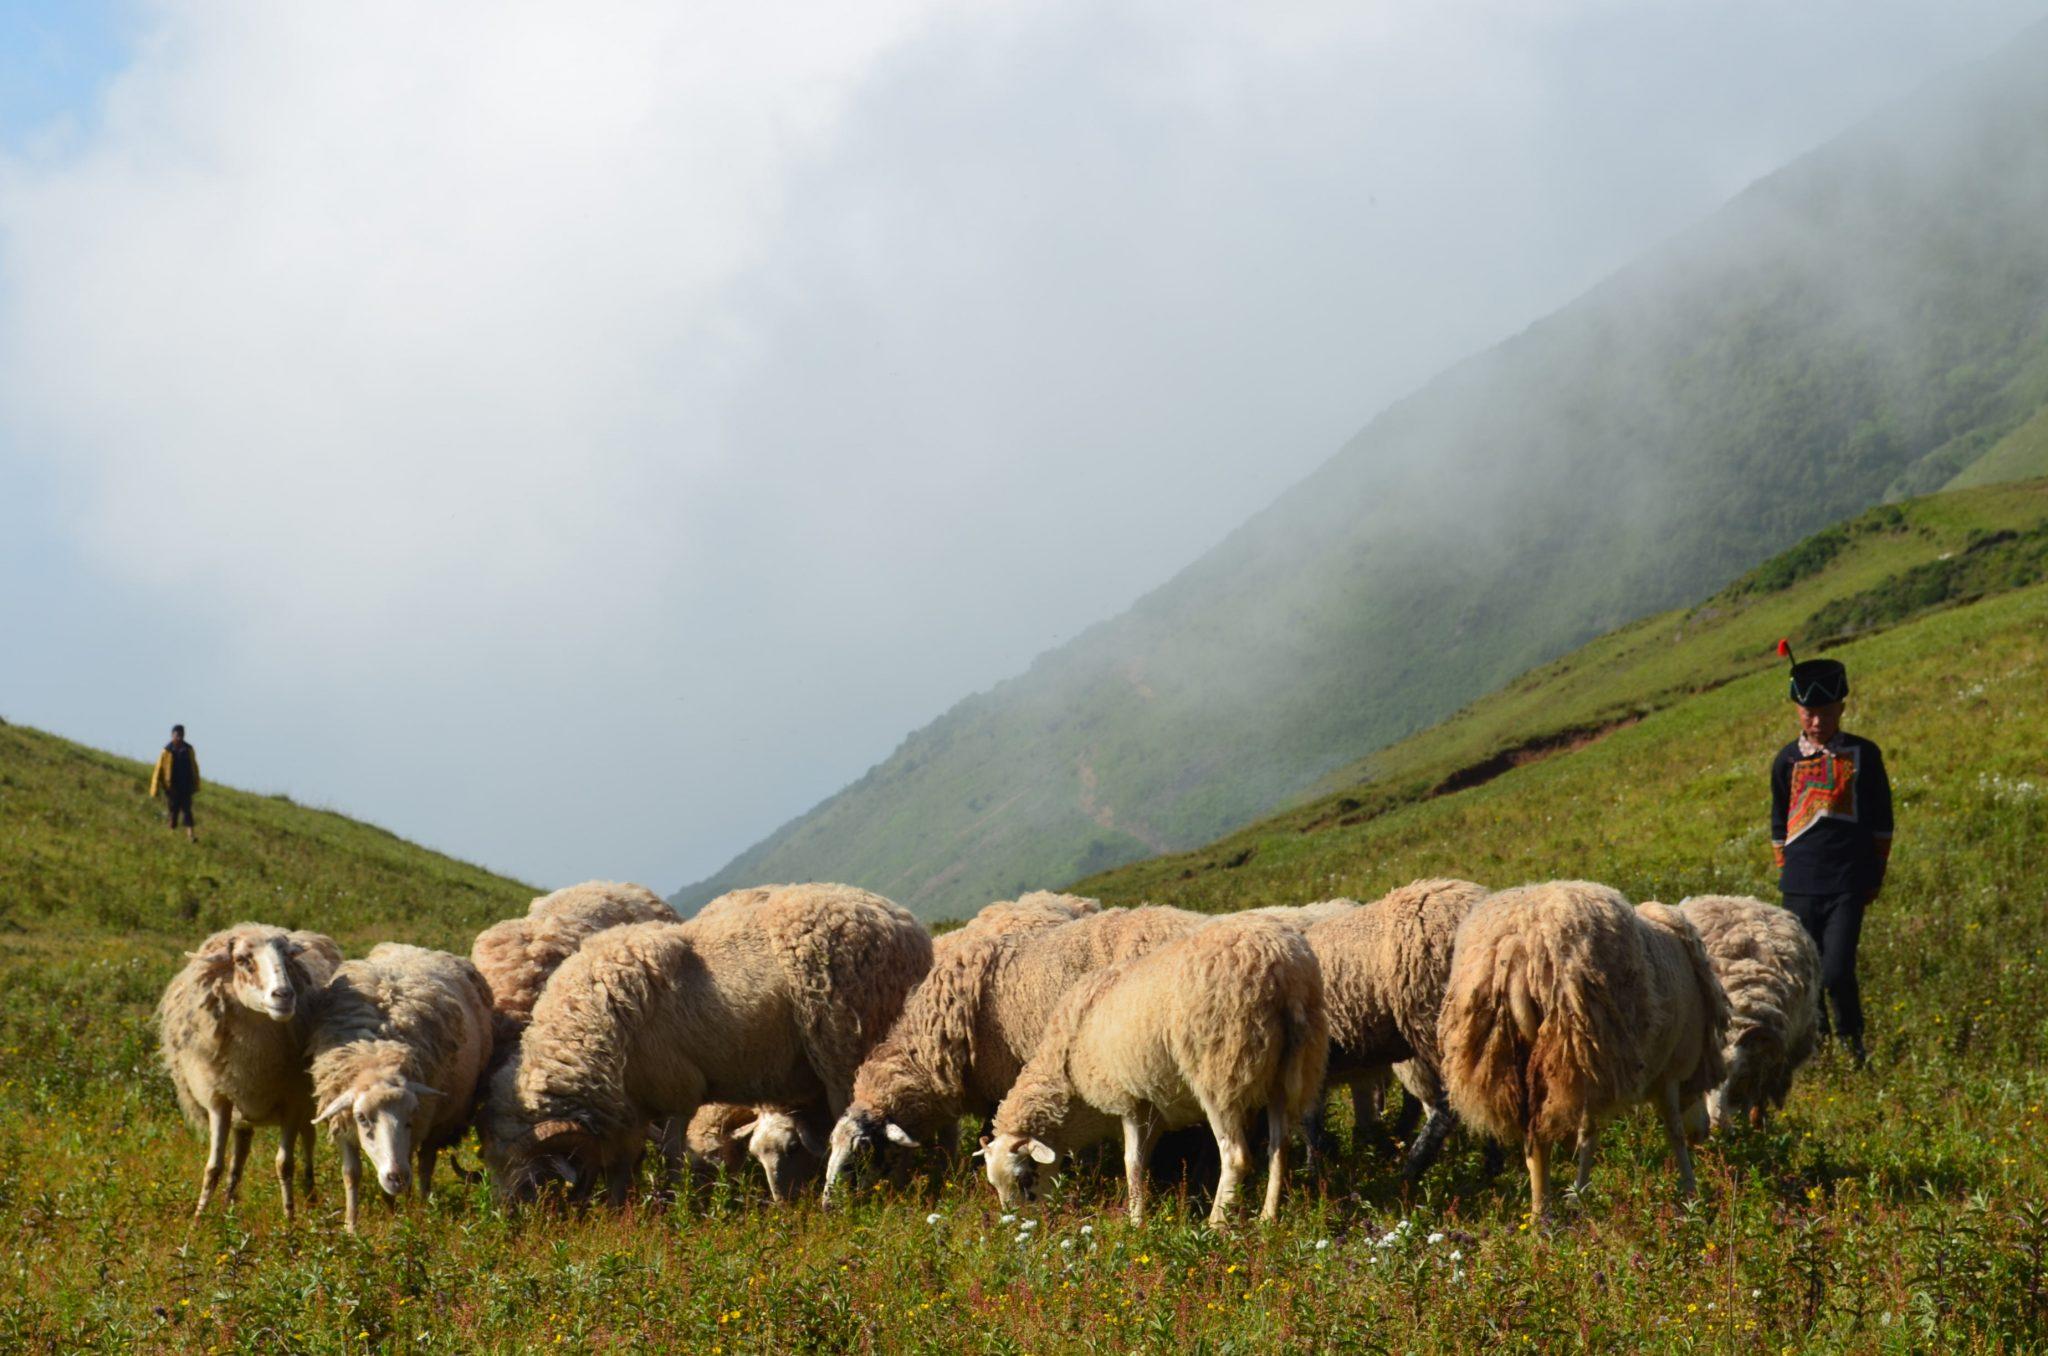 Cool Mountains Yi Prefecture China